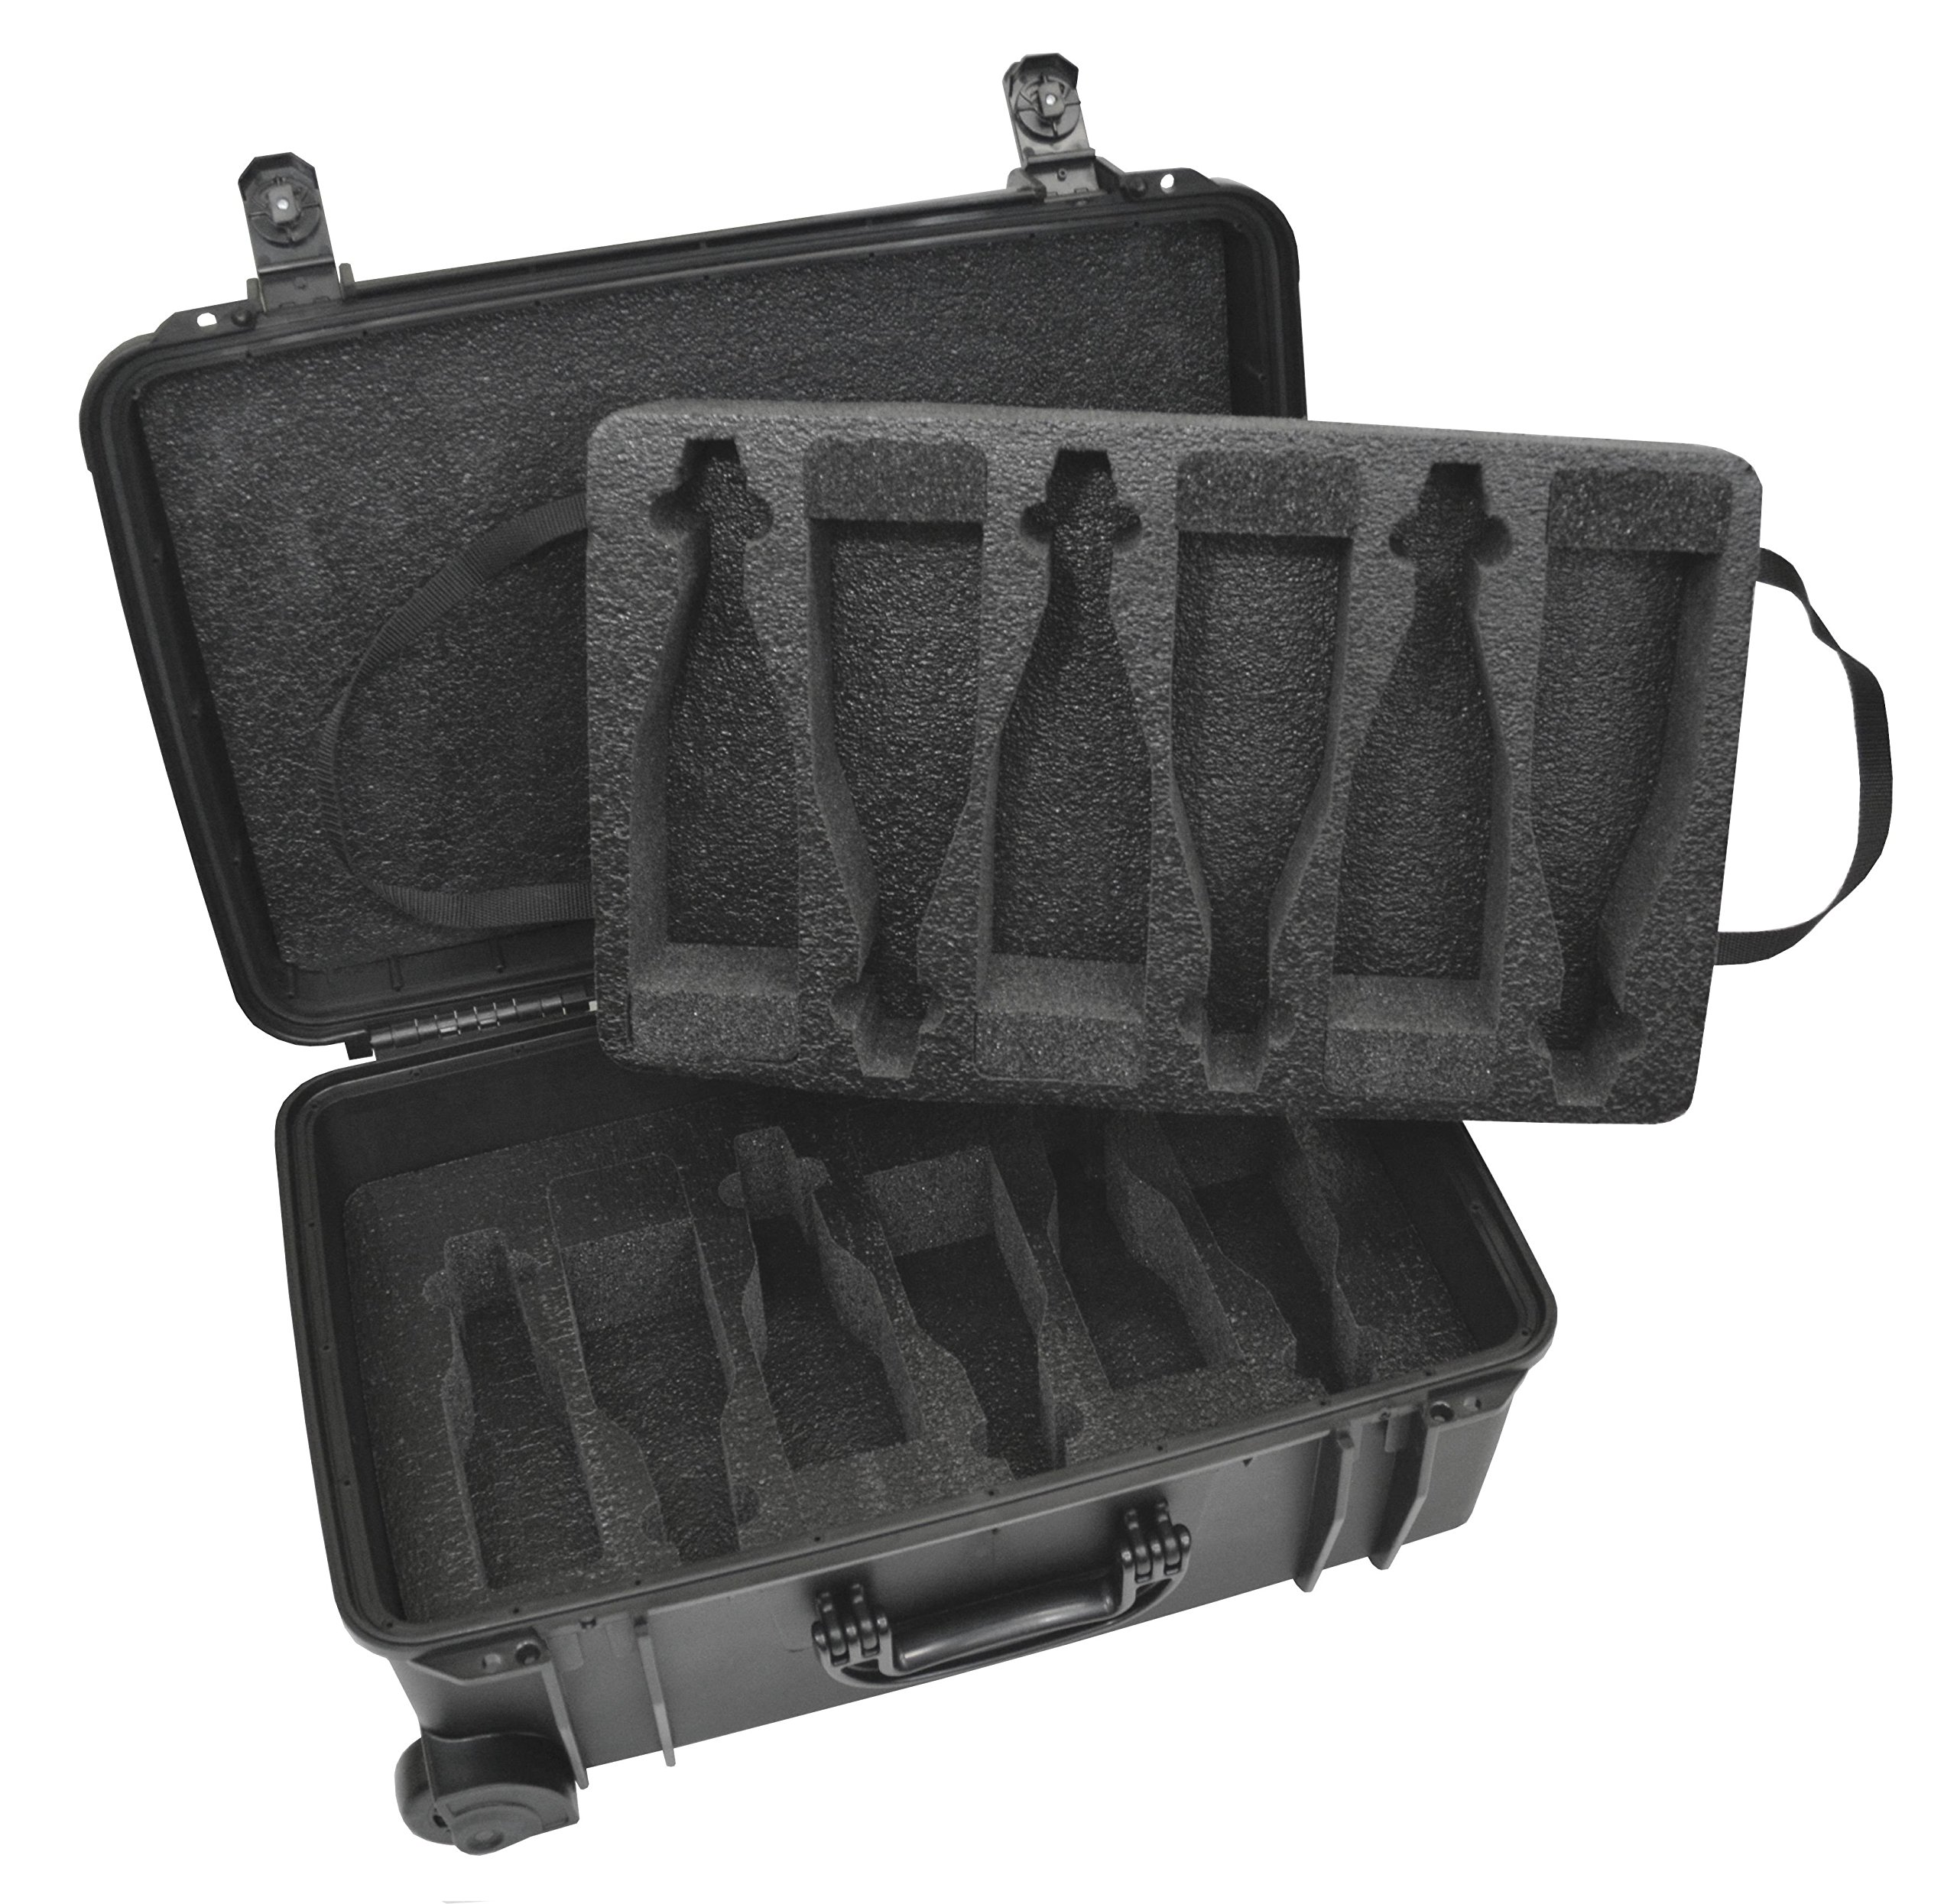 Waterproof Heavy Duty Wheeled Alcohol Travel Case – Beer And Wine Carrying Case Includes Custom Foam Insert Bottle Holder